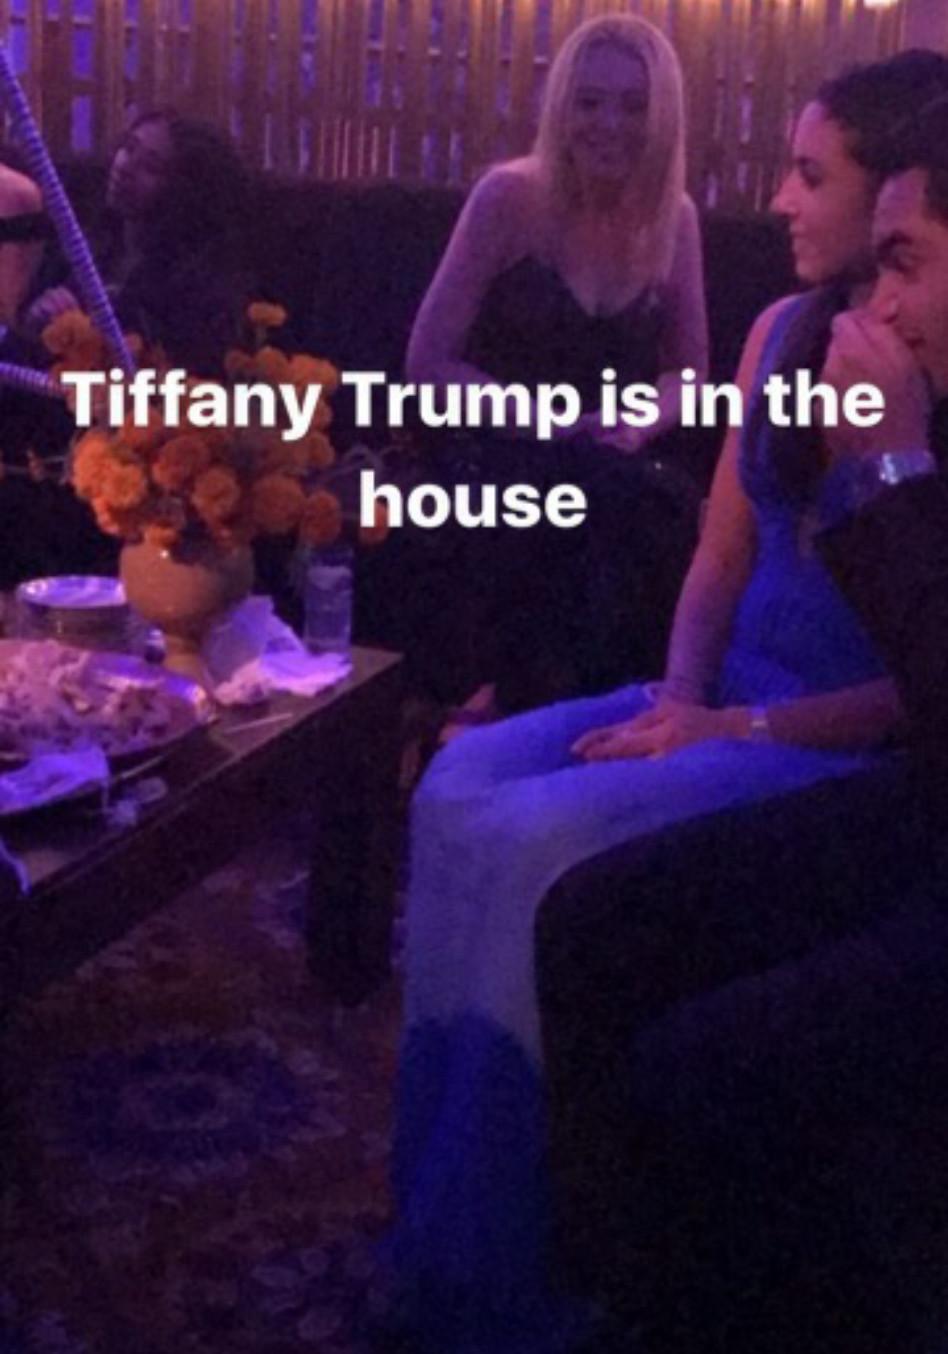 טיפאני טראמפ